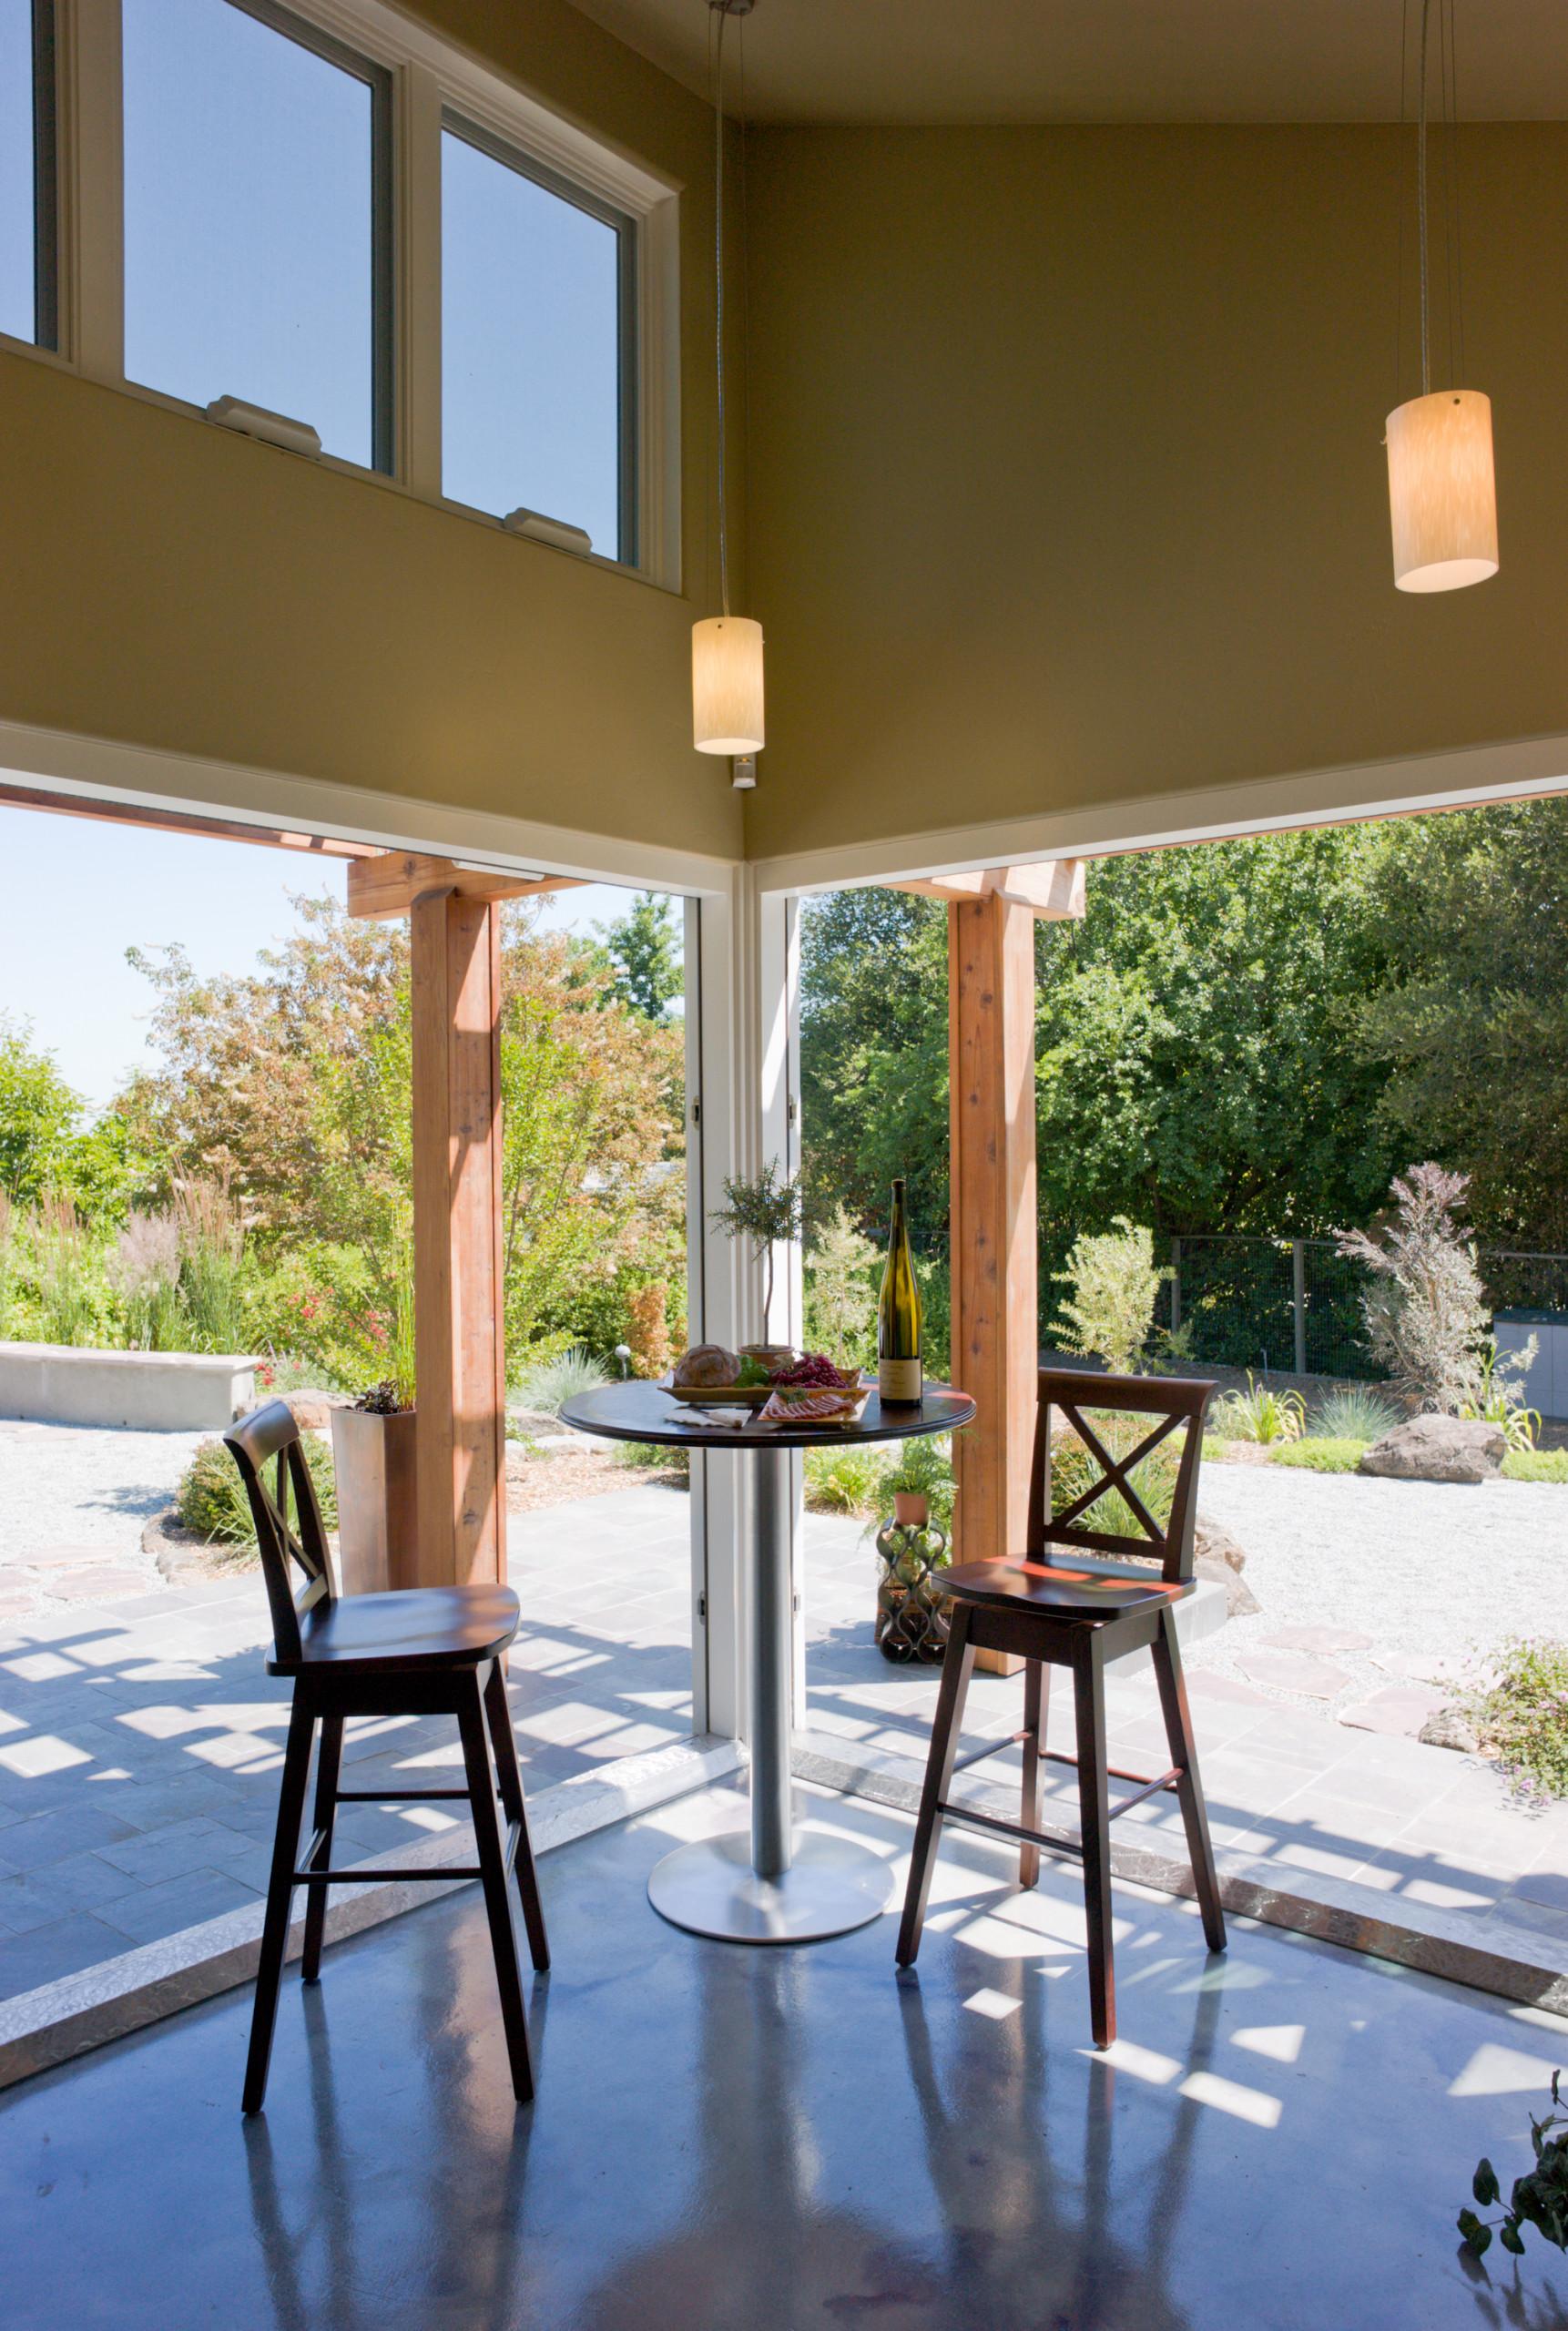 Wine Making Retreat & Workshop in Los Altos Hills